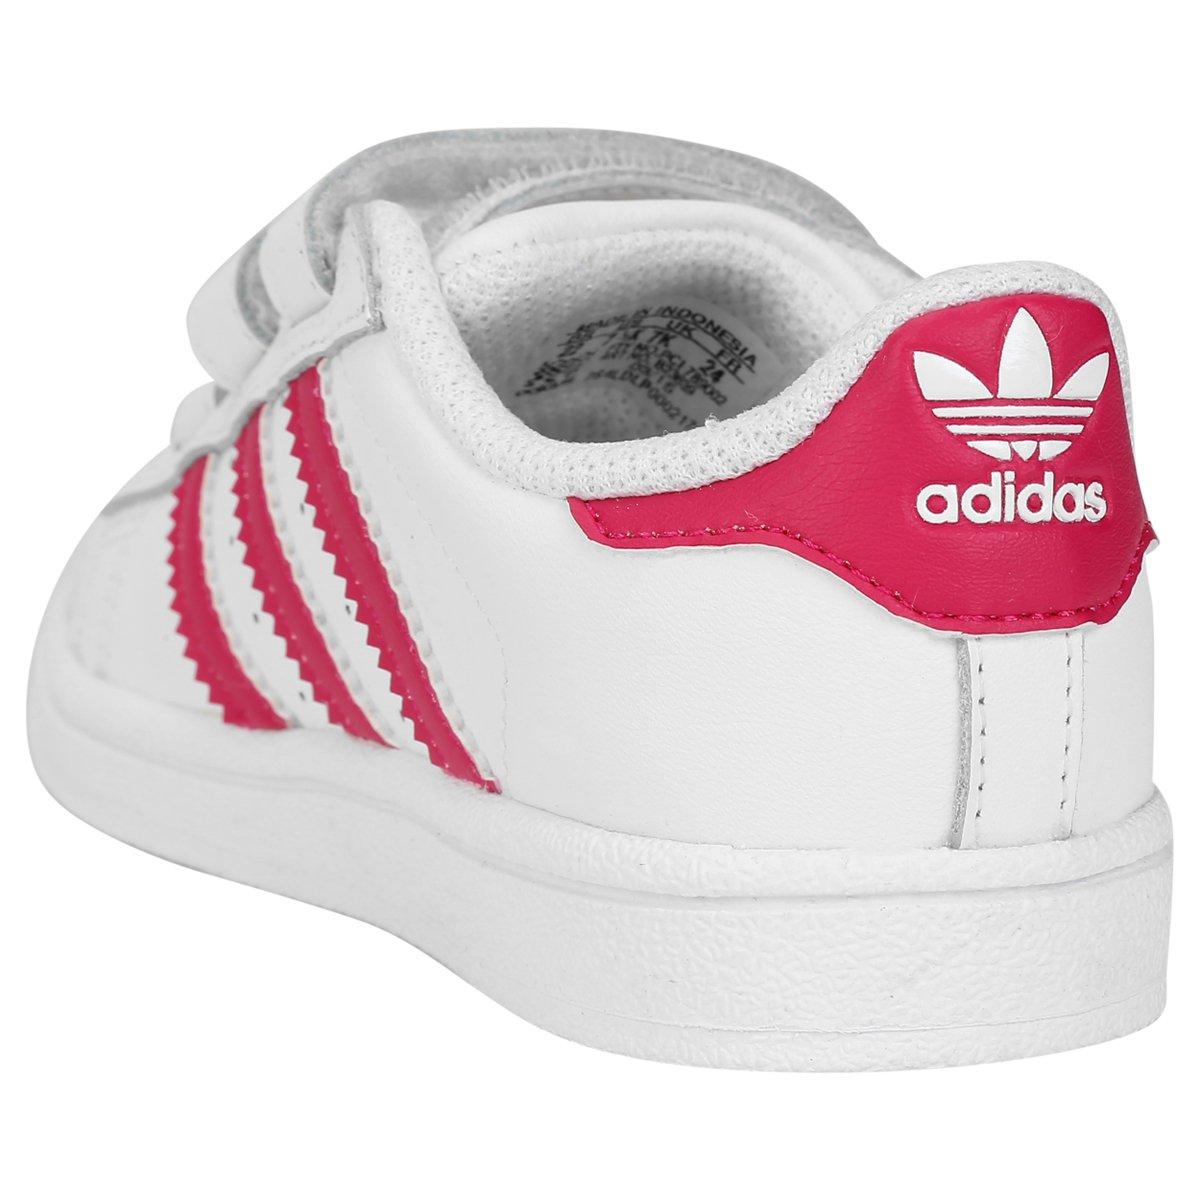 new style d700e 4302a ... Tênis Adidas Stan Smith GS Infantil Tênis é Na Magicfeet MagicFeet  7033a51bfbebcb ...